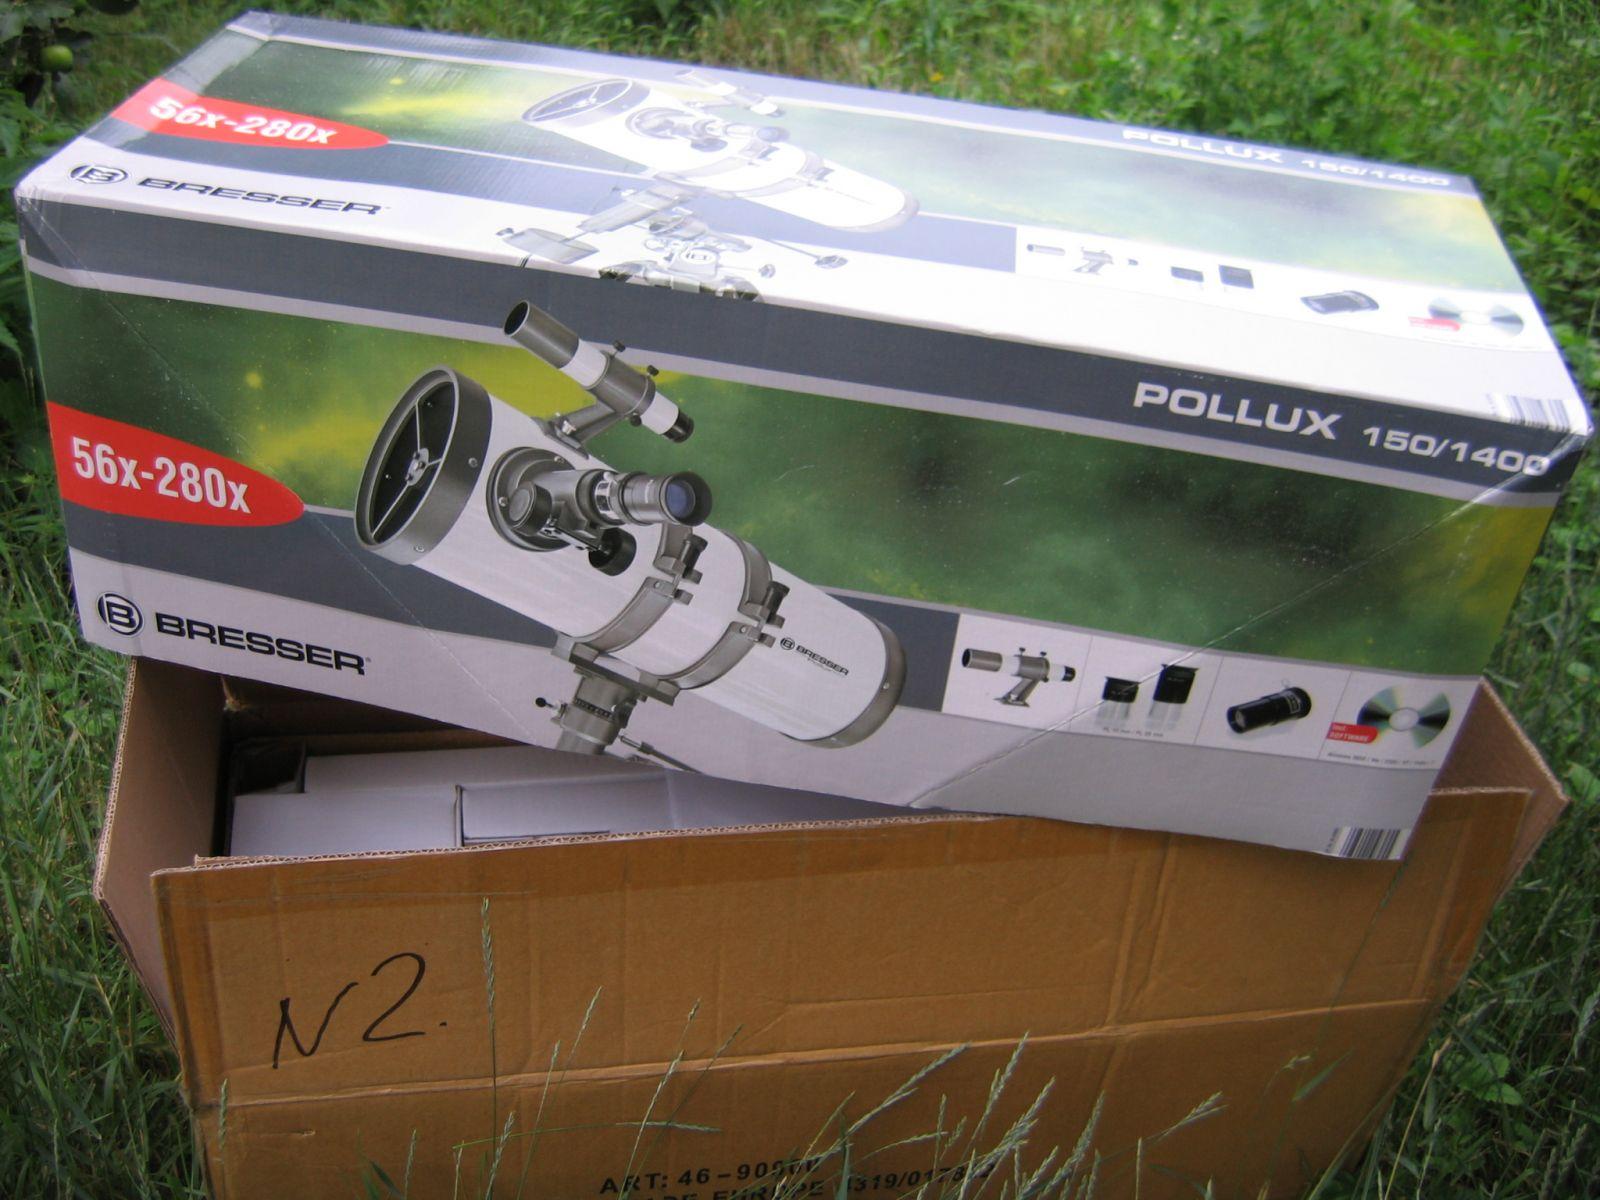 Bresser Pollux 150/1400 EQ-SKY